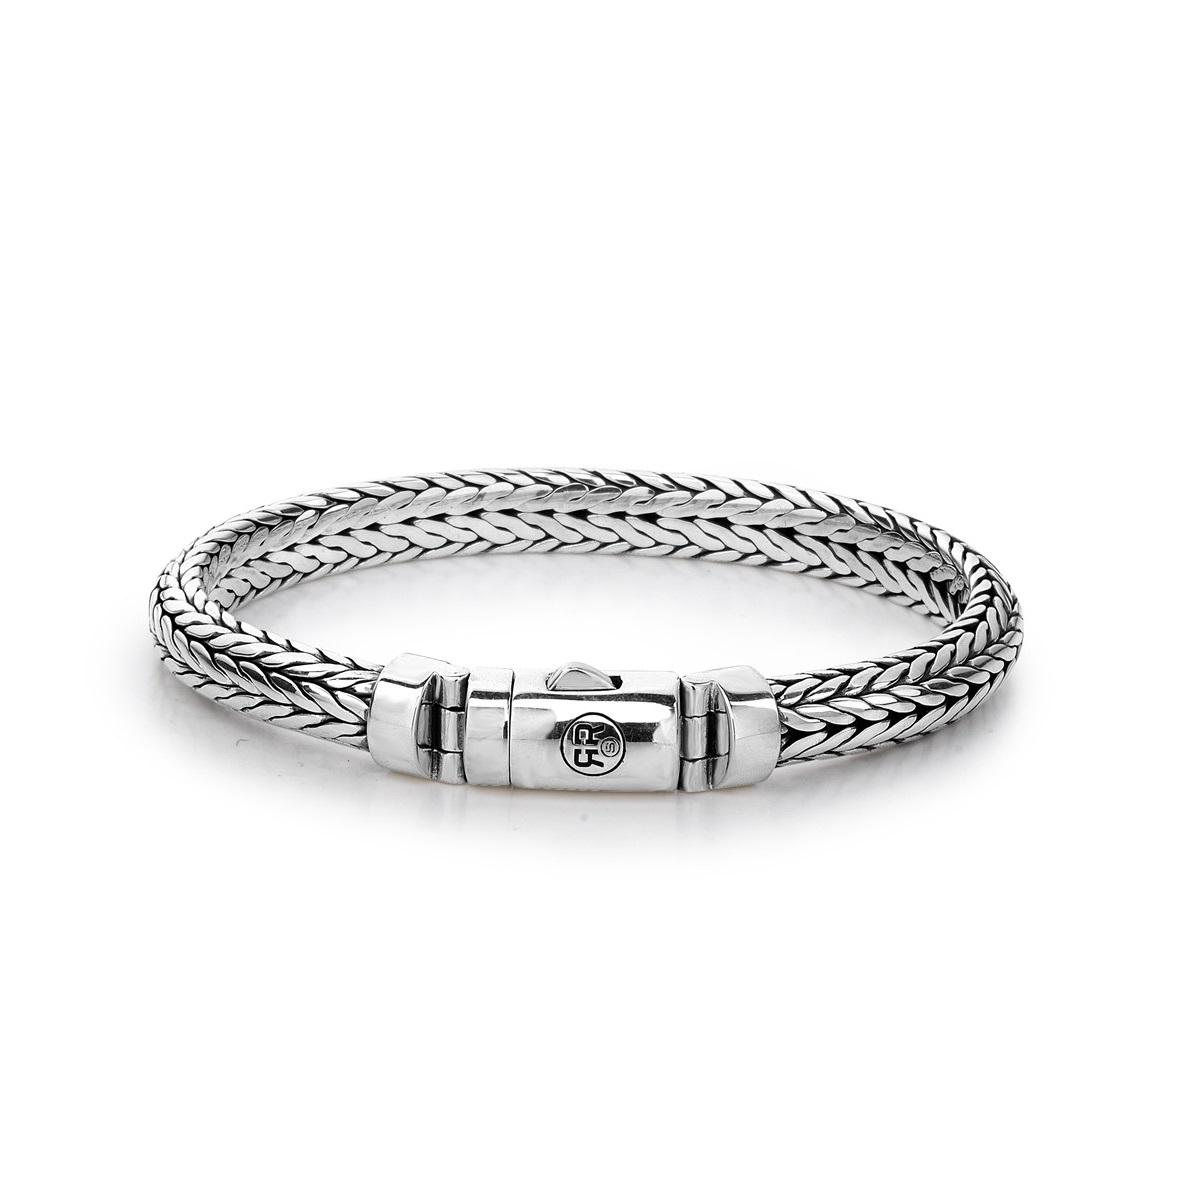 Rebel & Rose IRIS Silver Bracelet S